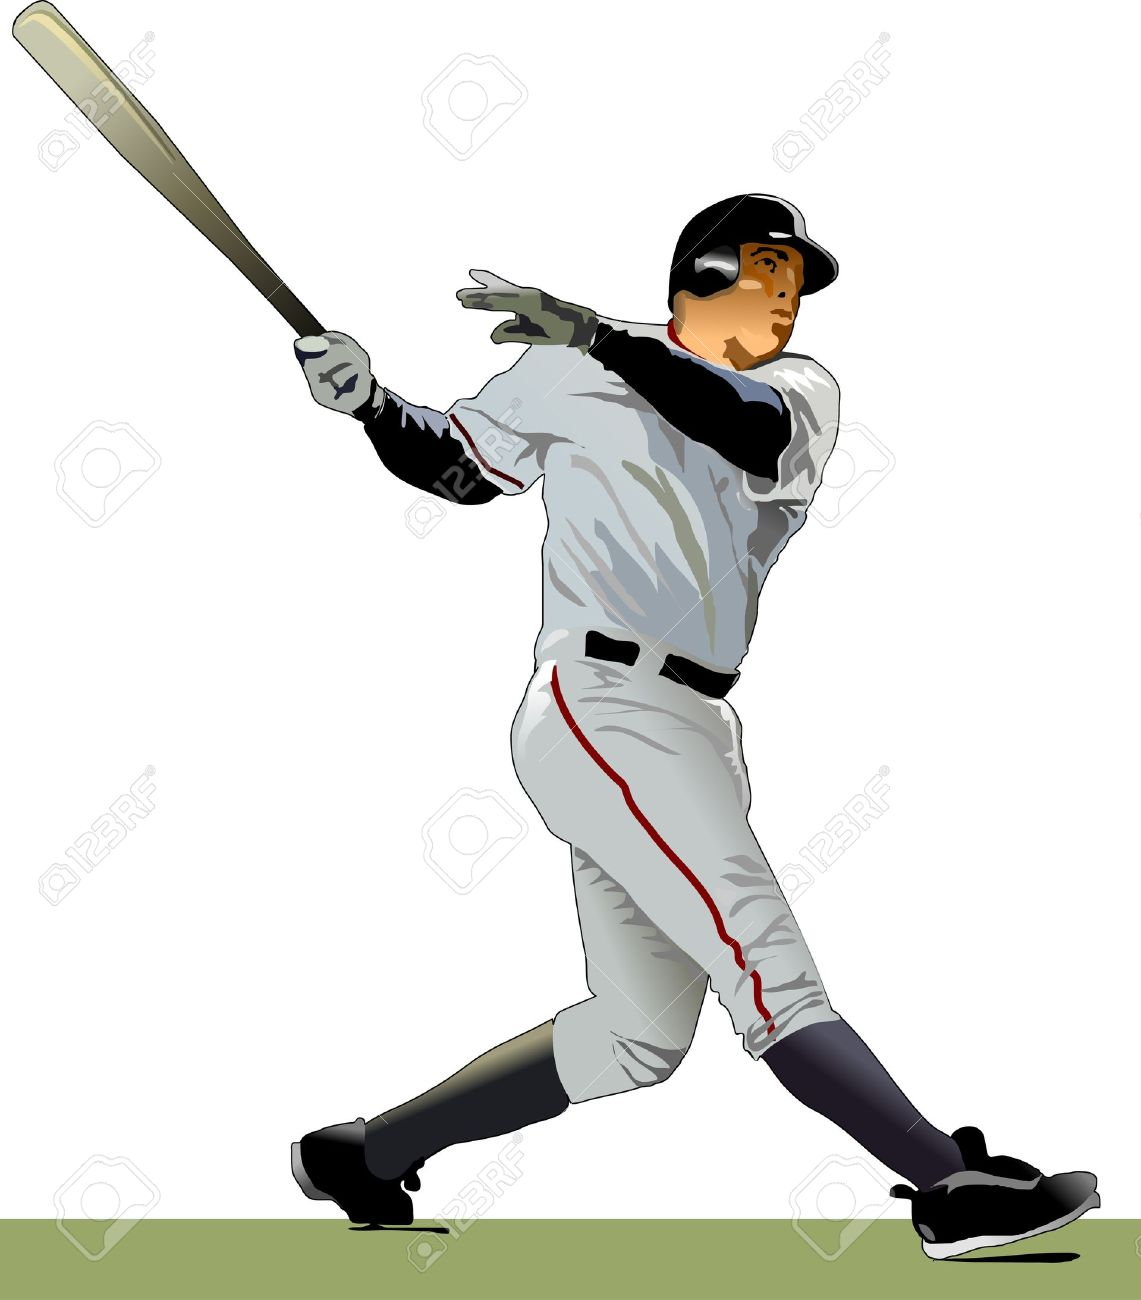 baseball batter illustration royalty free cliparts vectors and rh 123rf com Baseball Logos Clip Art Baseball Logos Clip Art